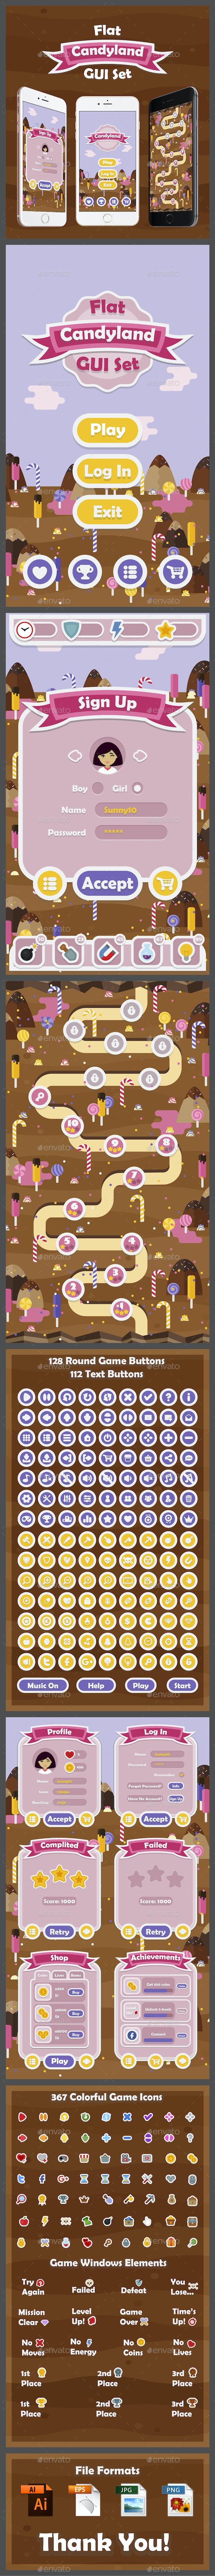 Flat Candyland GUI Set - User Interfaces Game Assets